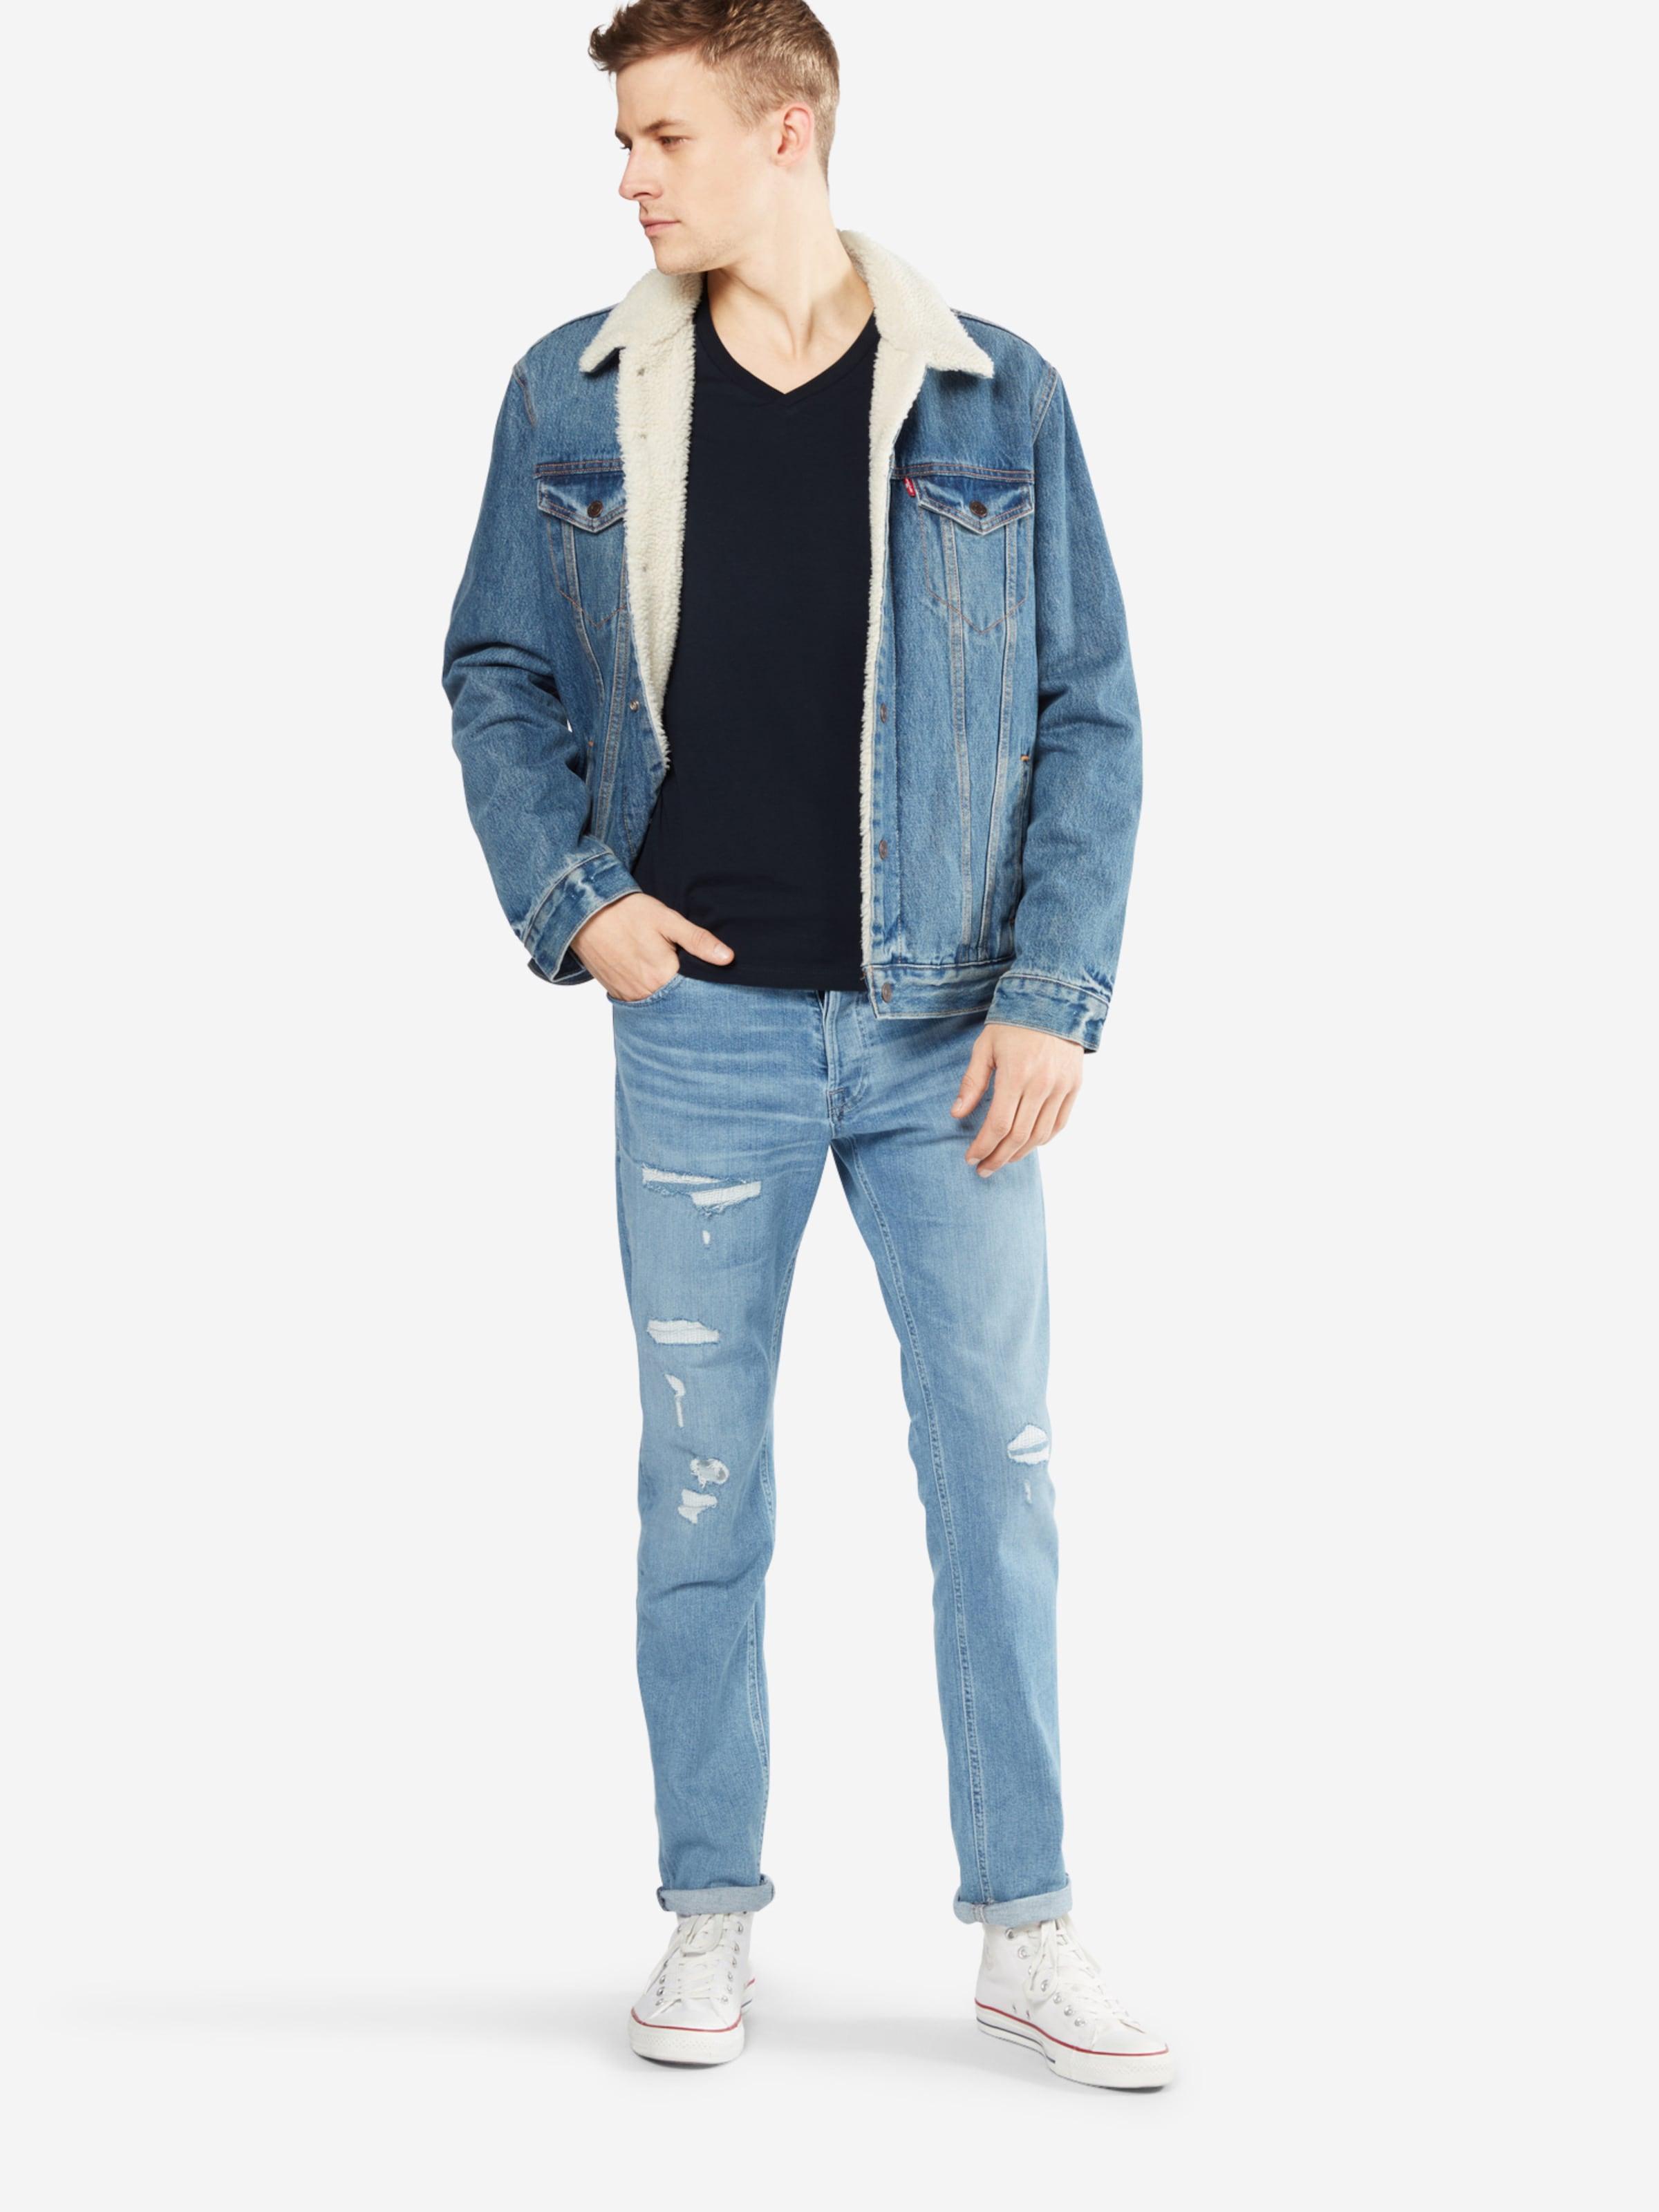 Steckdose Erkunden Preiswerte Qualität SELECTED HOMME T-Shirt V-Ausschnitt Online Günstig Online piQILqqCLY